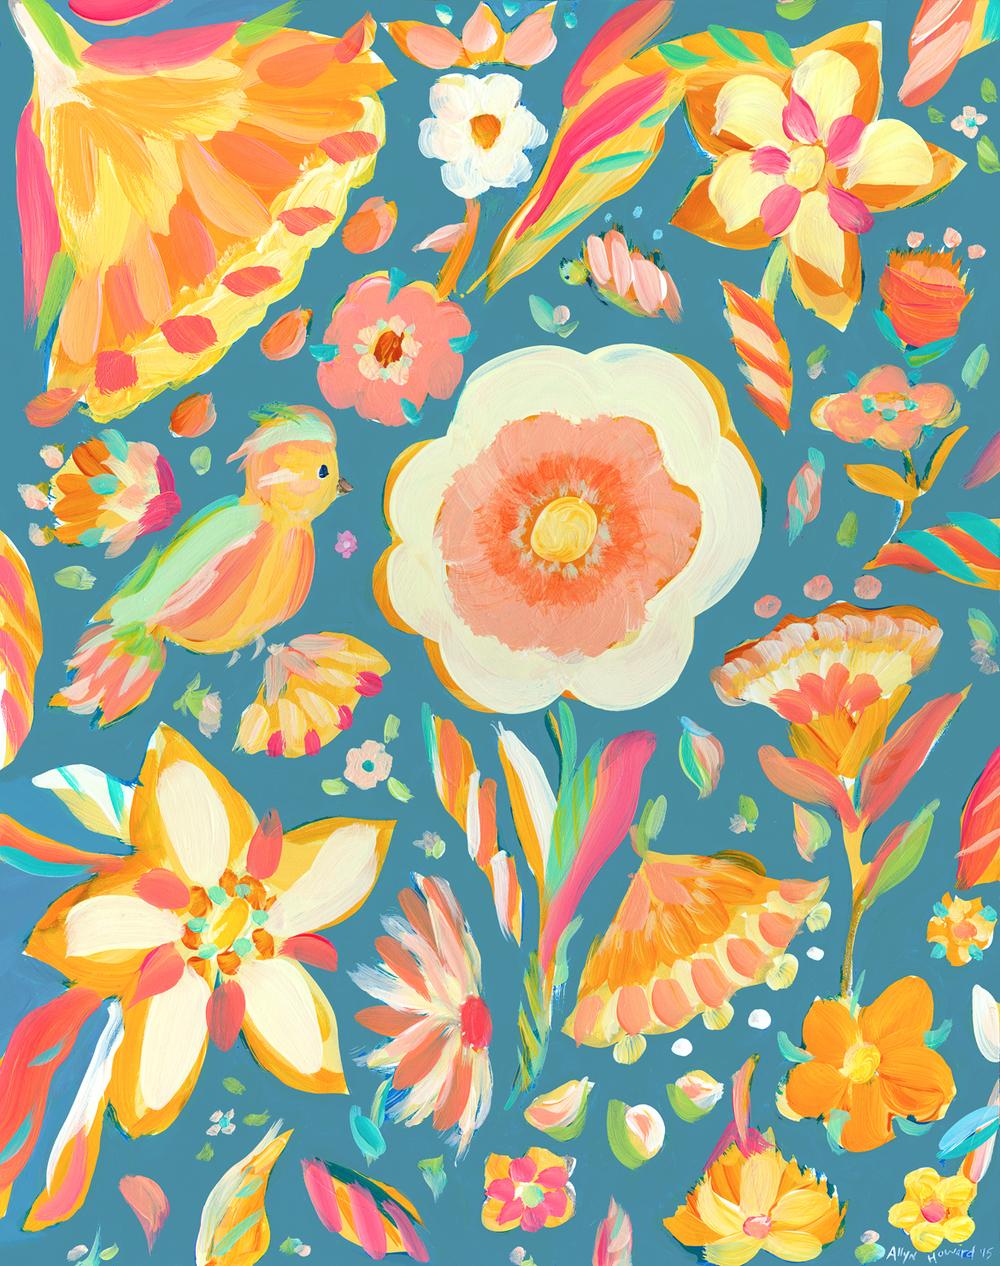 6 Tropical_delight_floral_Allyn_Howard.jpg